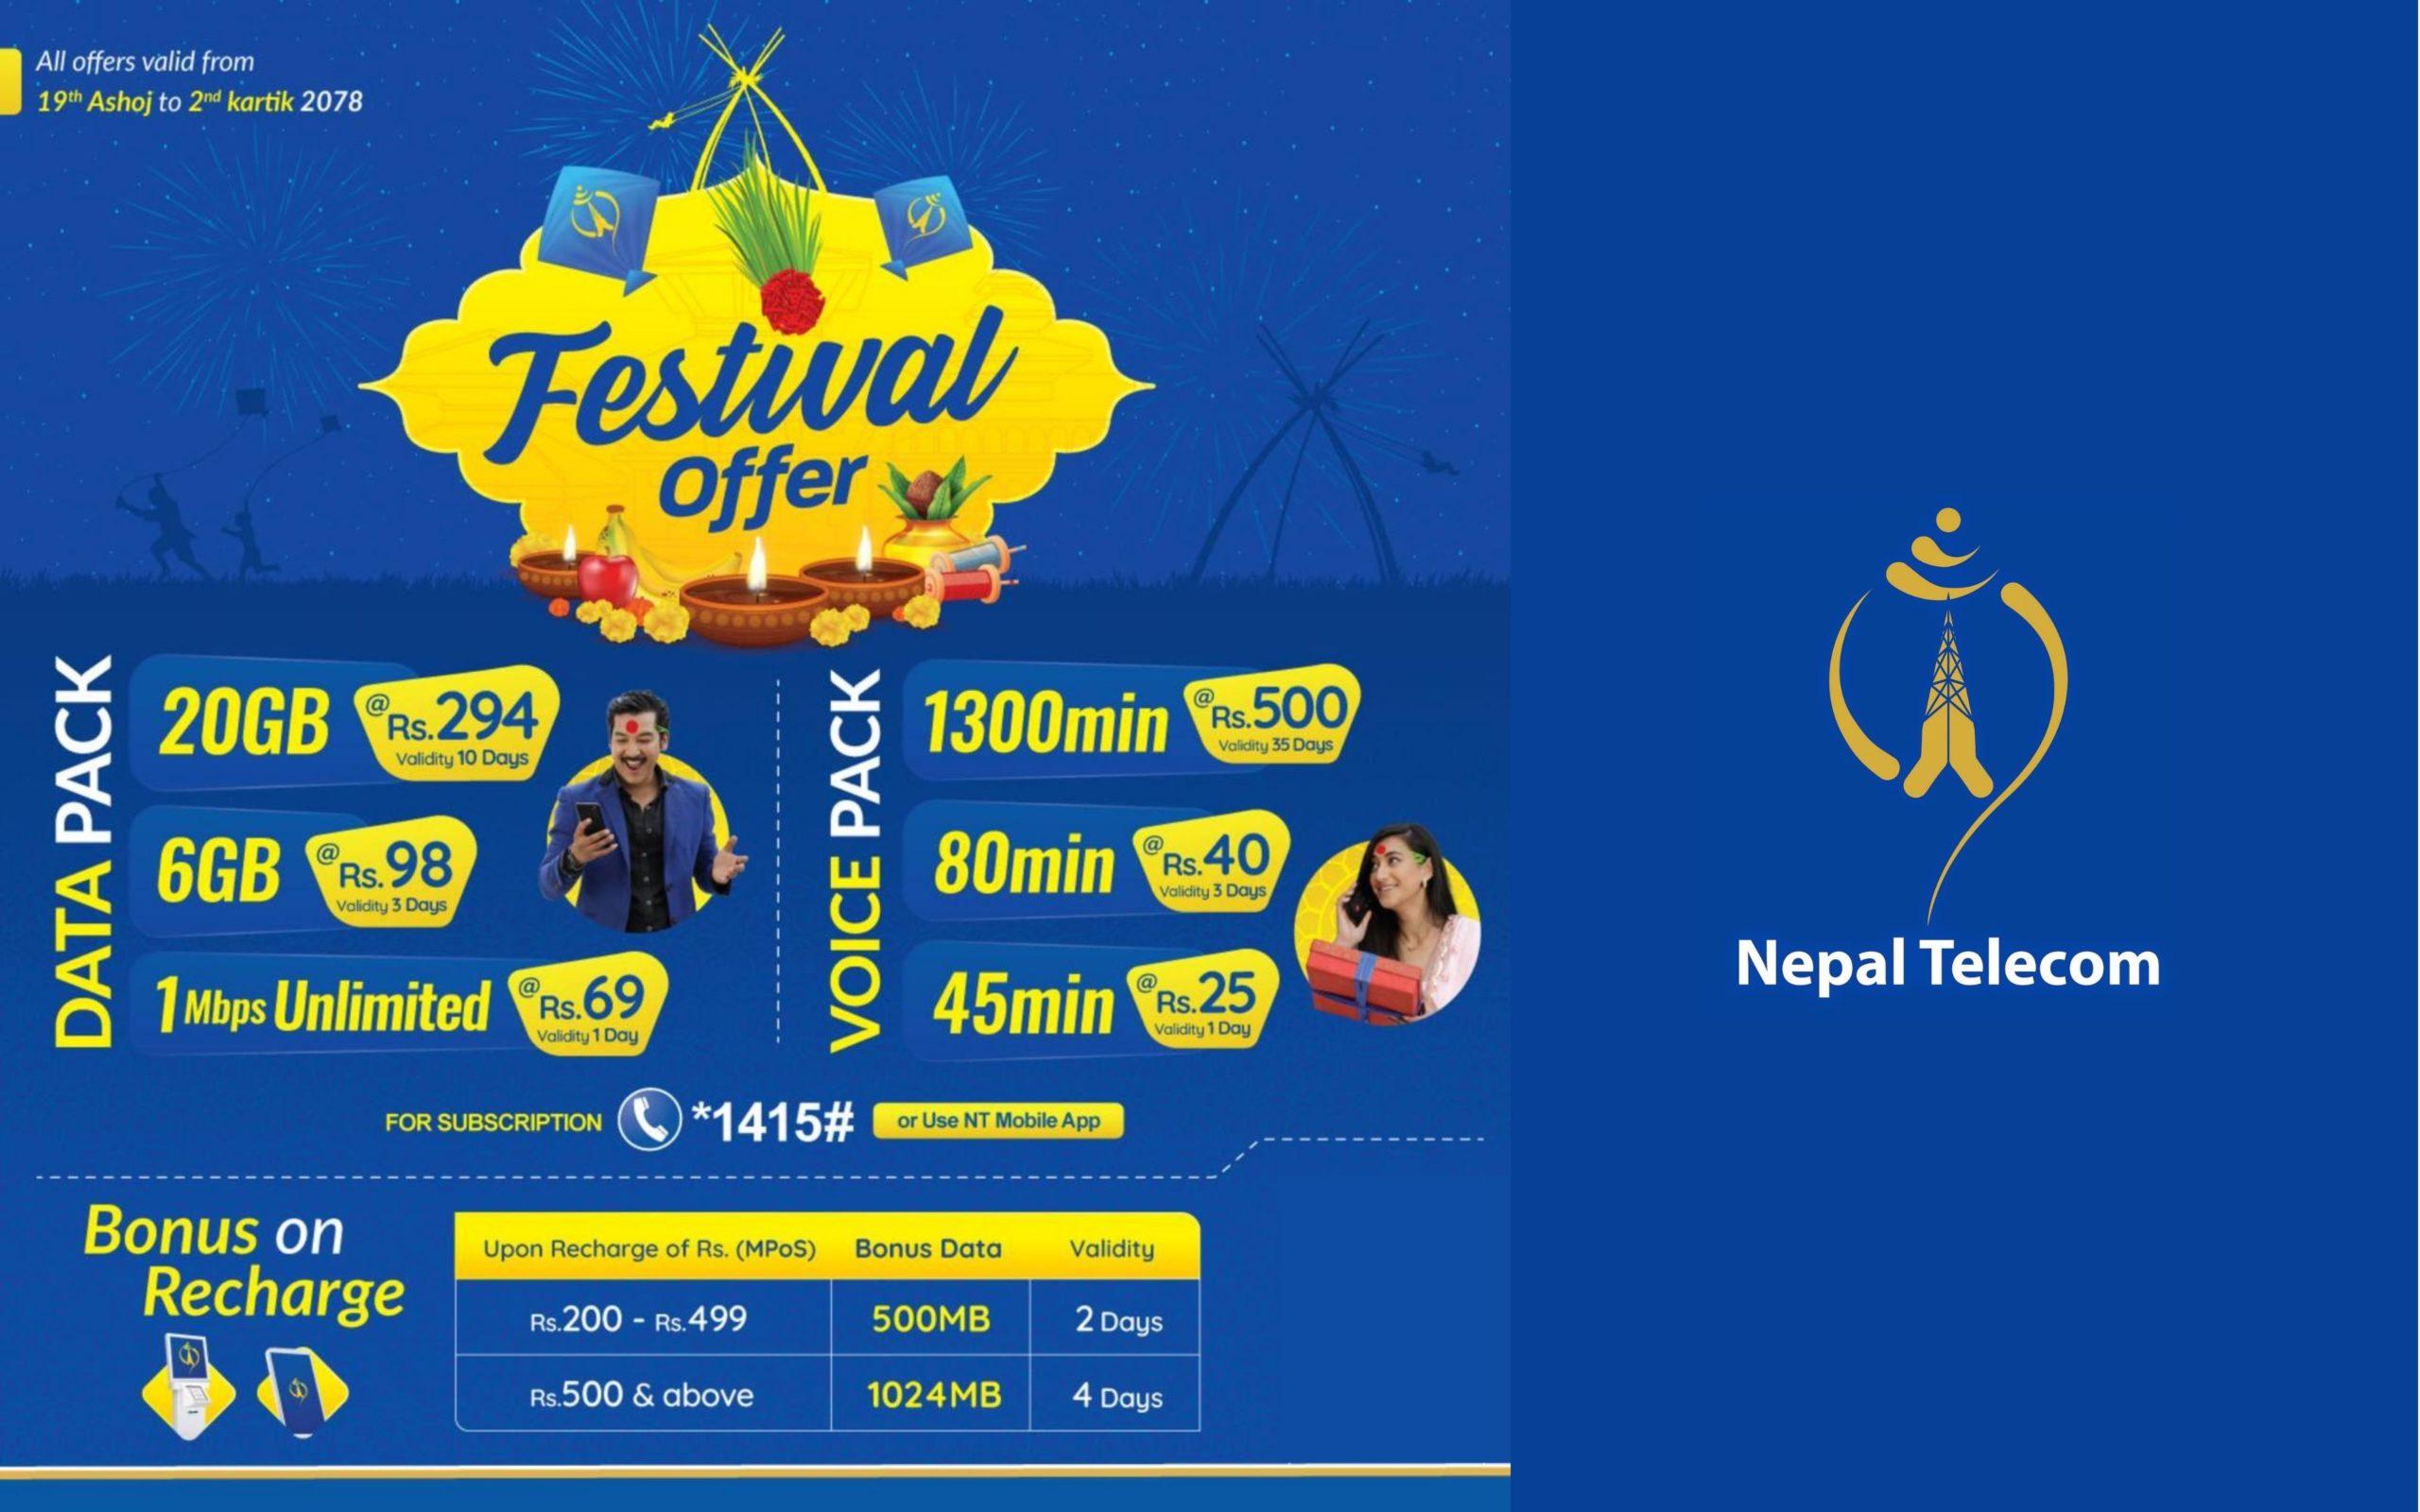 Nepal Telecom brings Data & Voice pack offers » Meroshare